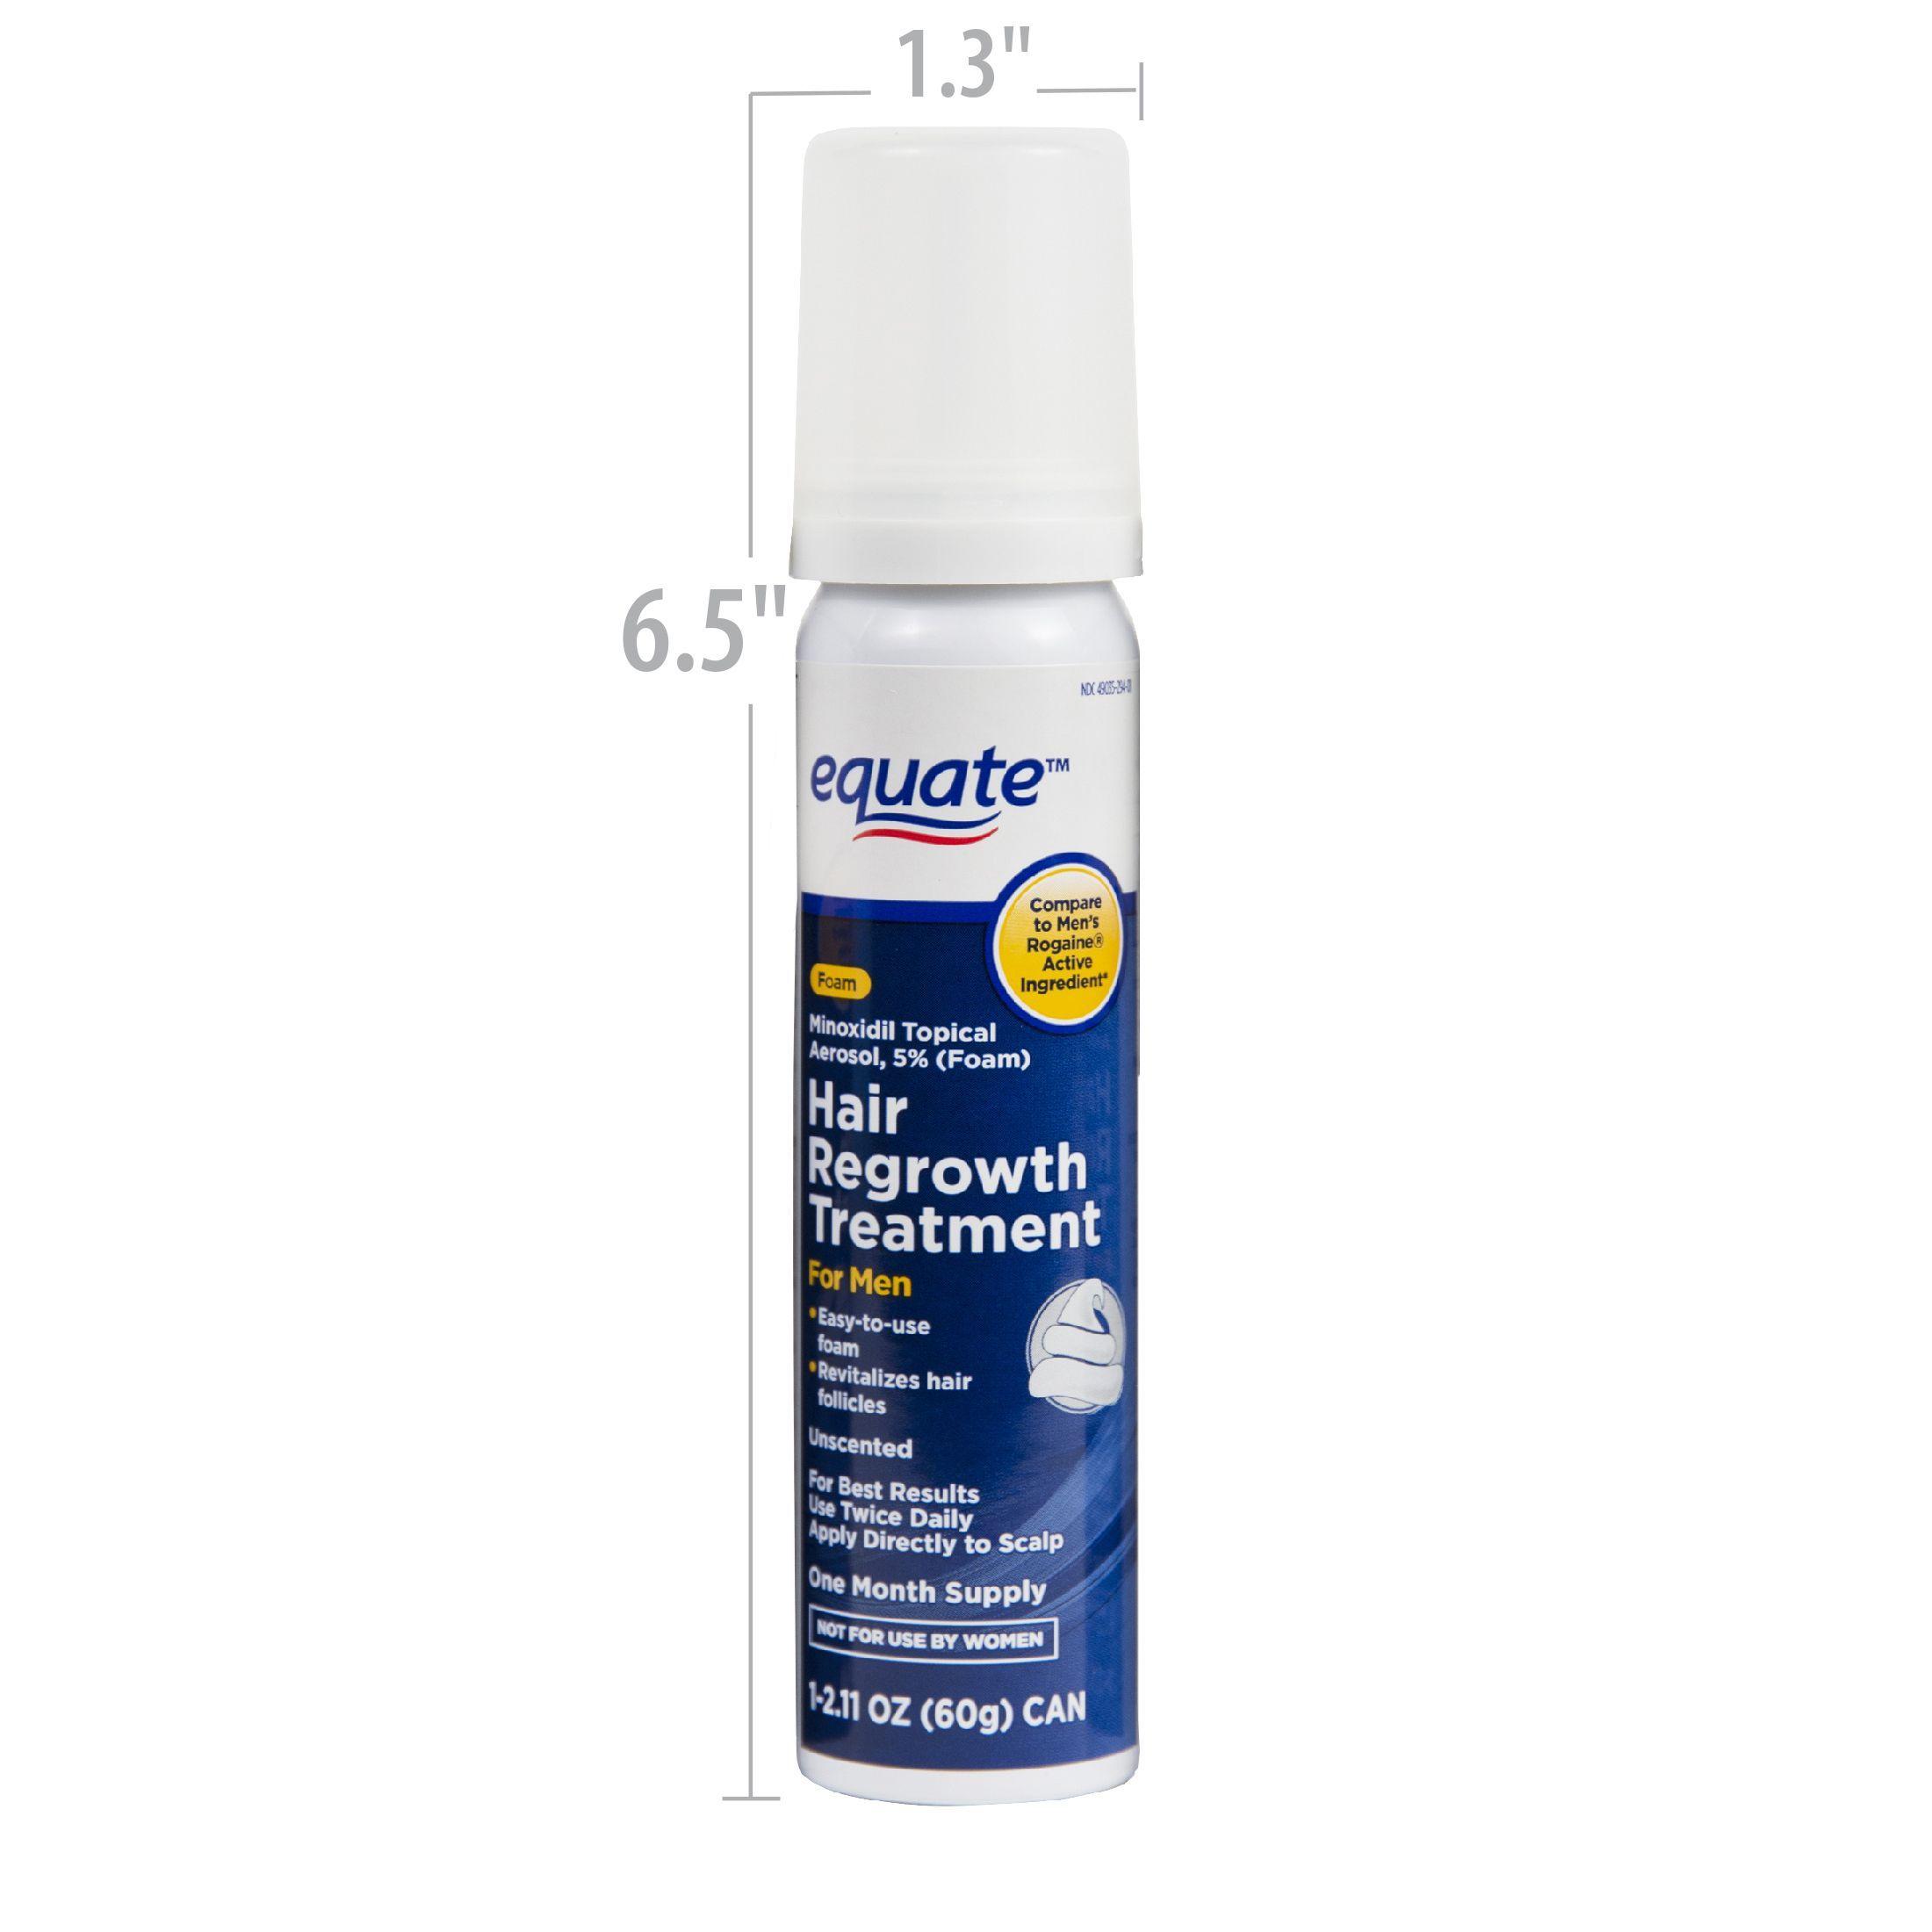 6Month Equate Foam Hair Mens Minoxidil Regrowth